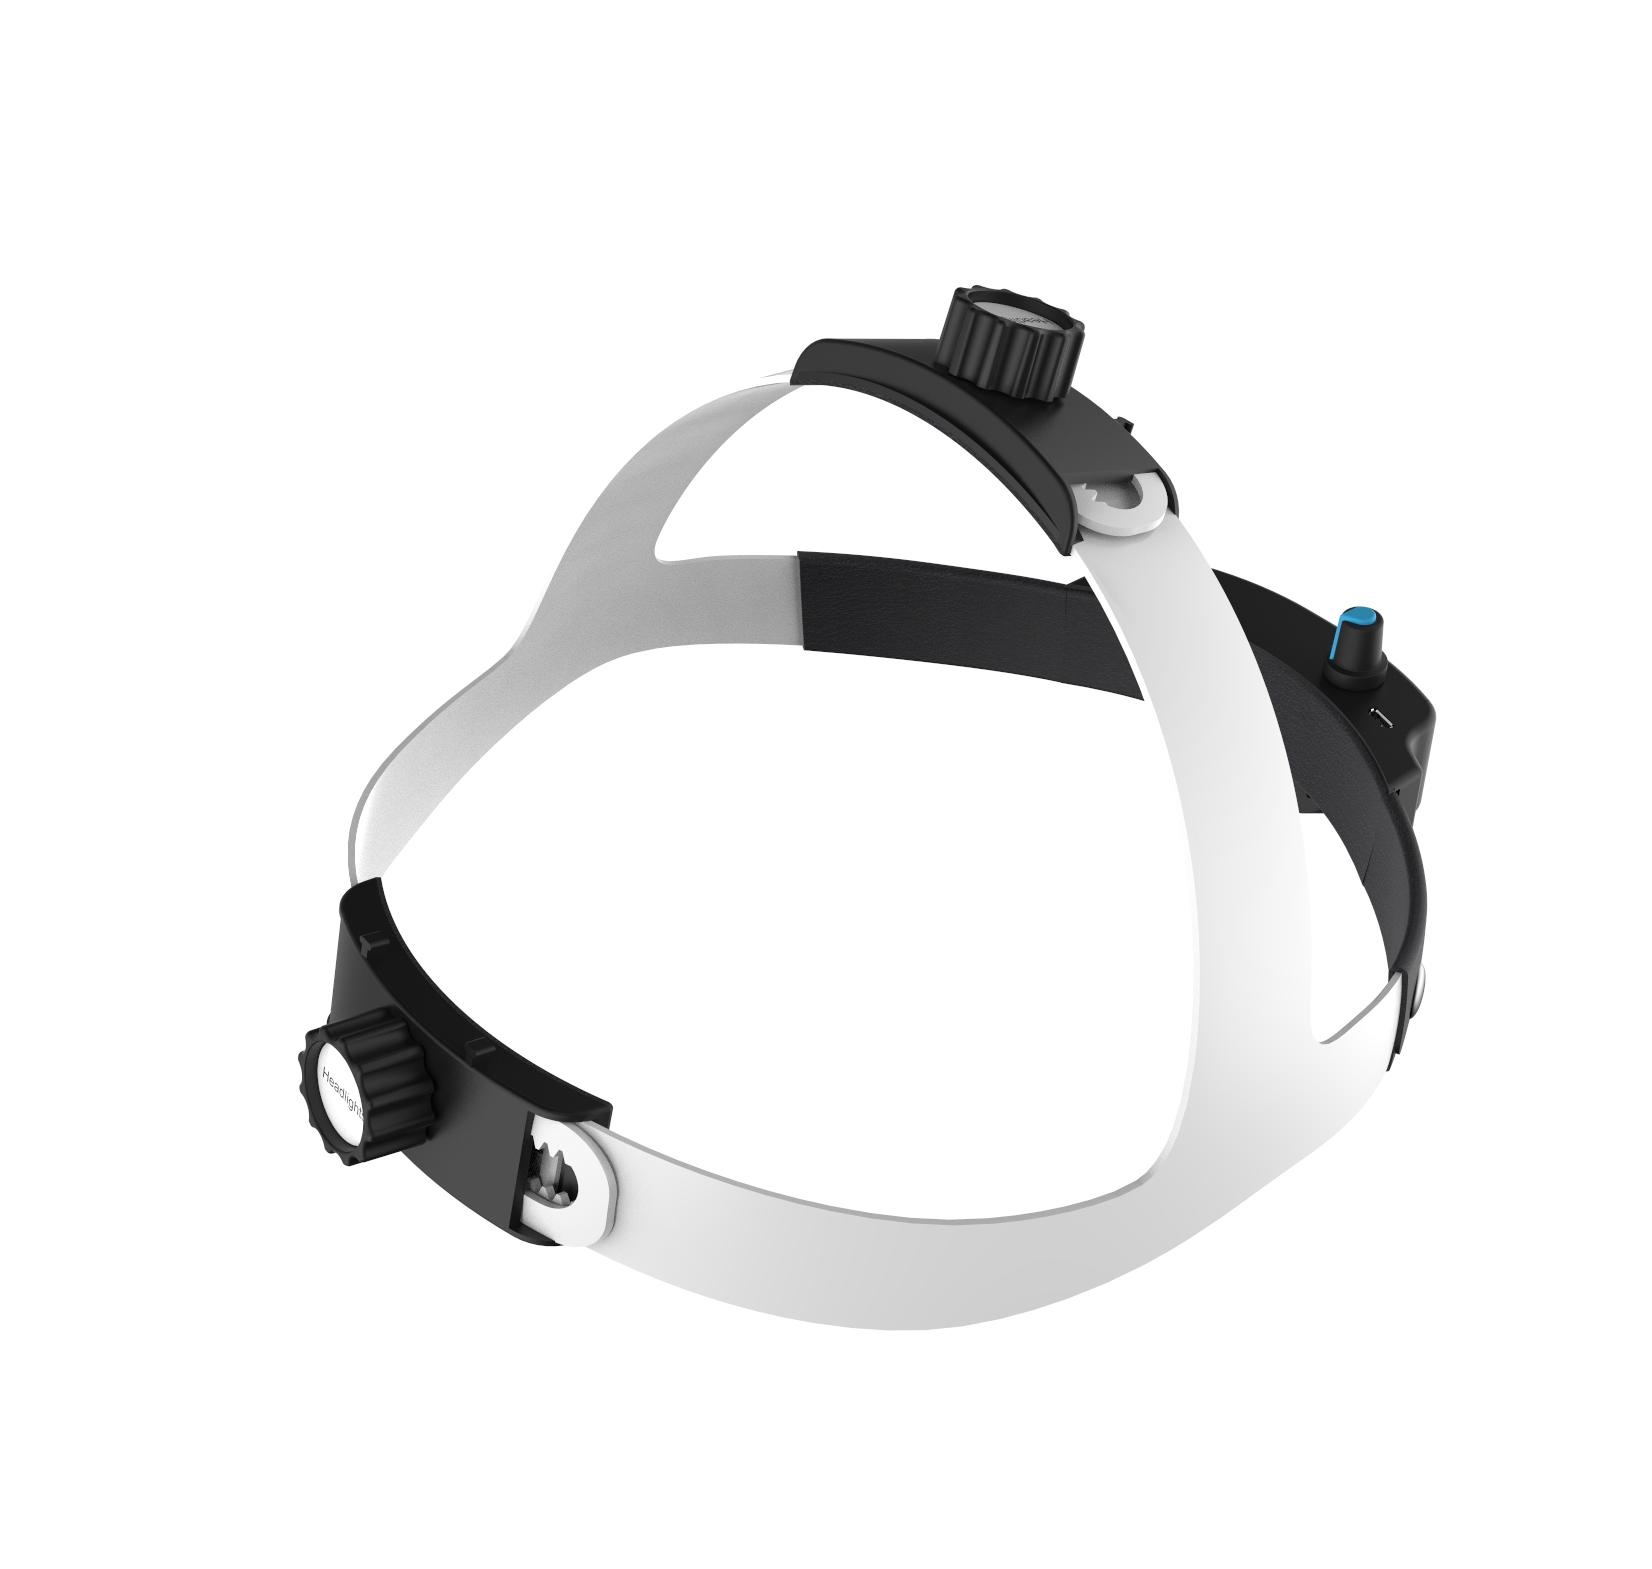 3W LED Headlight for Dental Loupes Spotlight Illuminator for Medical Surgery Beauty Oral Cavity Dentist Headlamp  (TD-M01B-F) enlarge